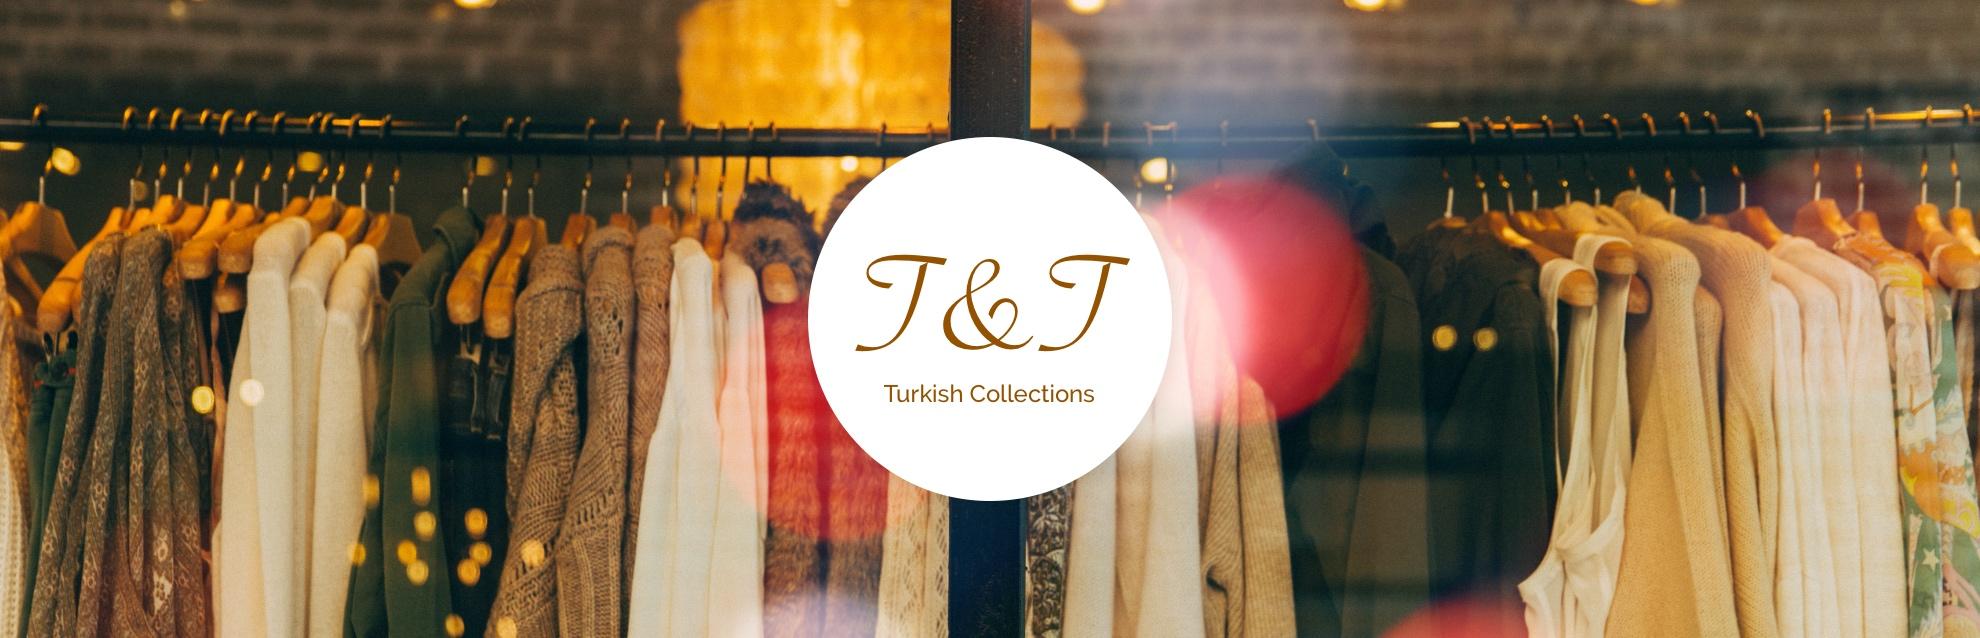 TT Turkish collections